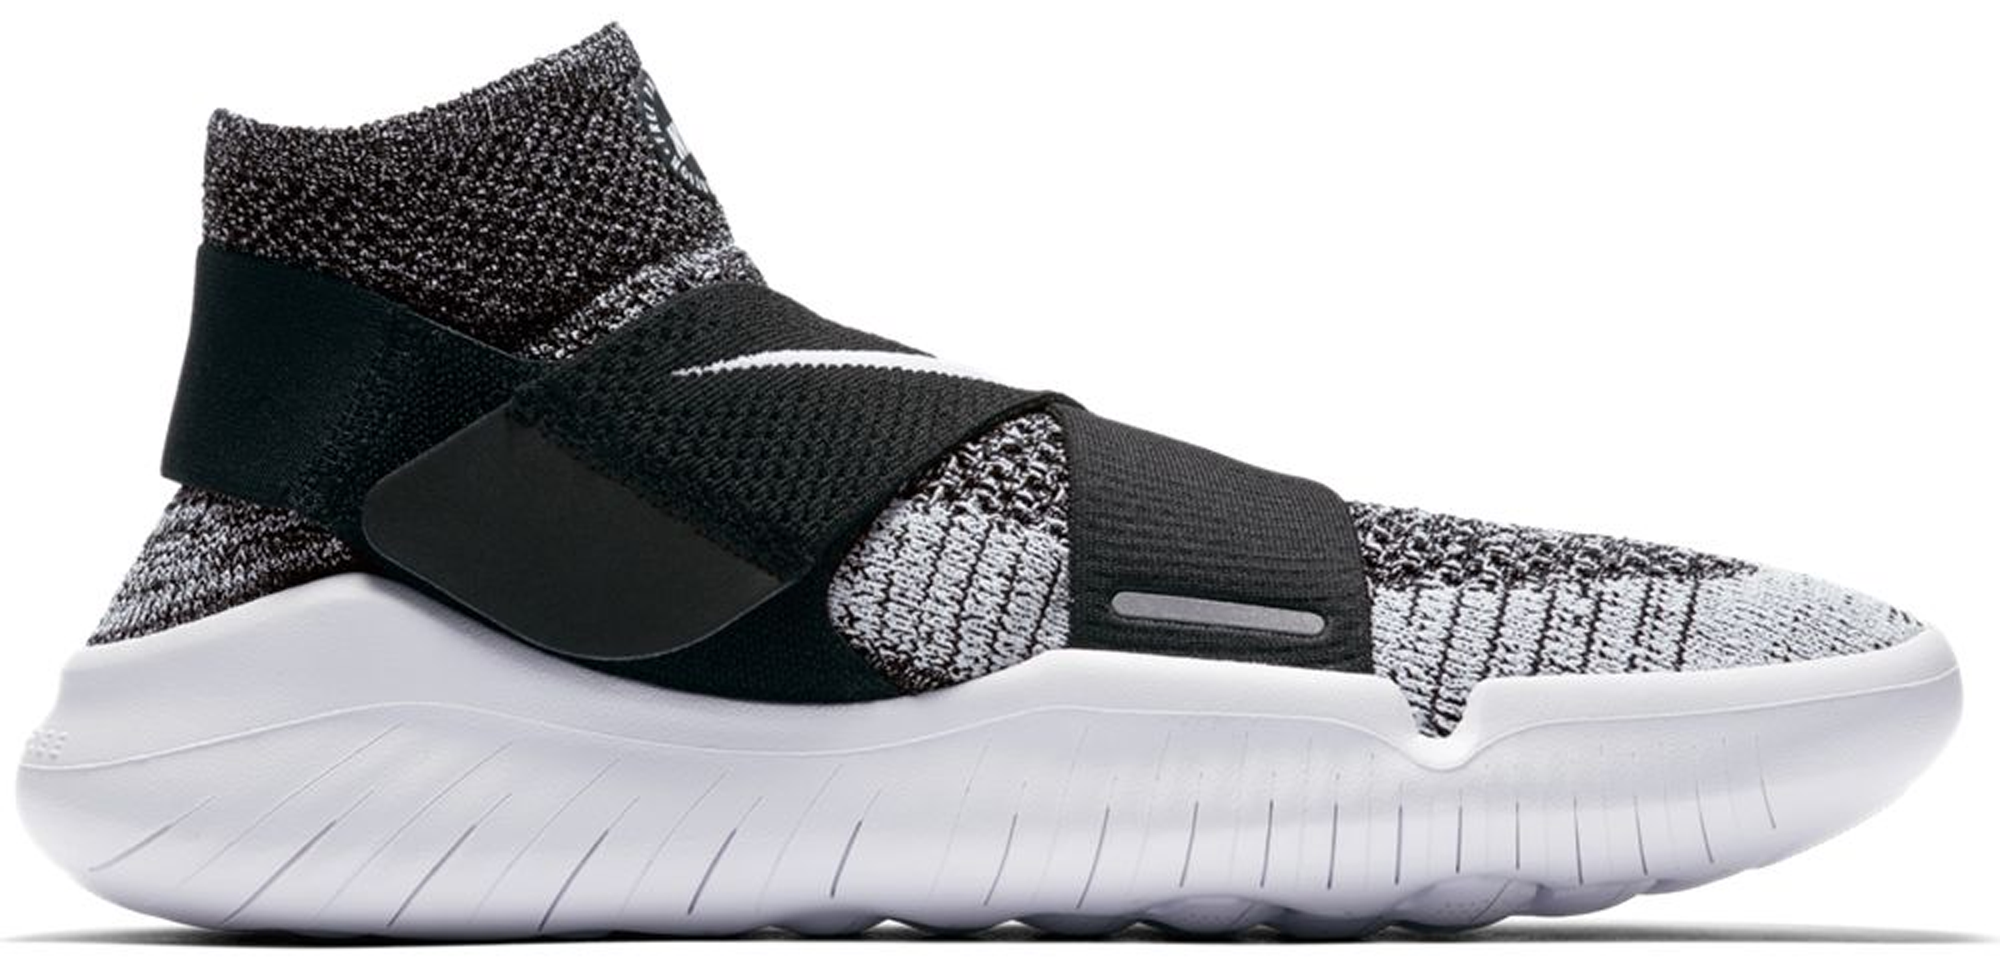 Nike Free RN Motion Flyknit 2018 Oreo